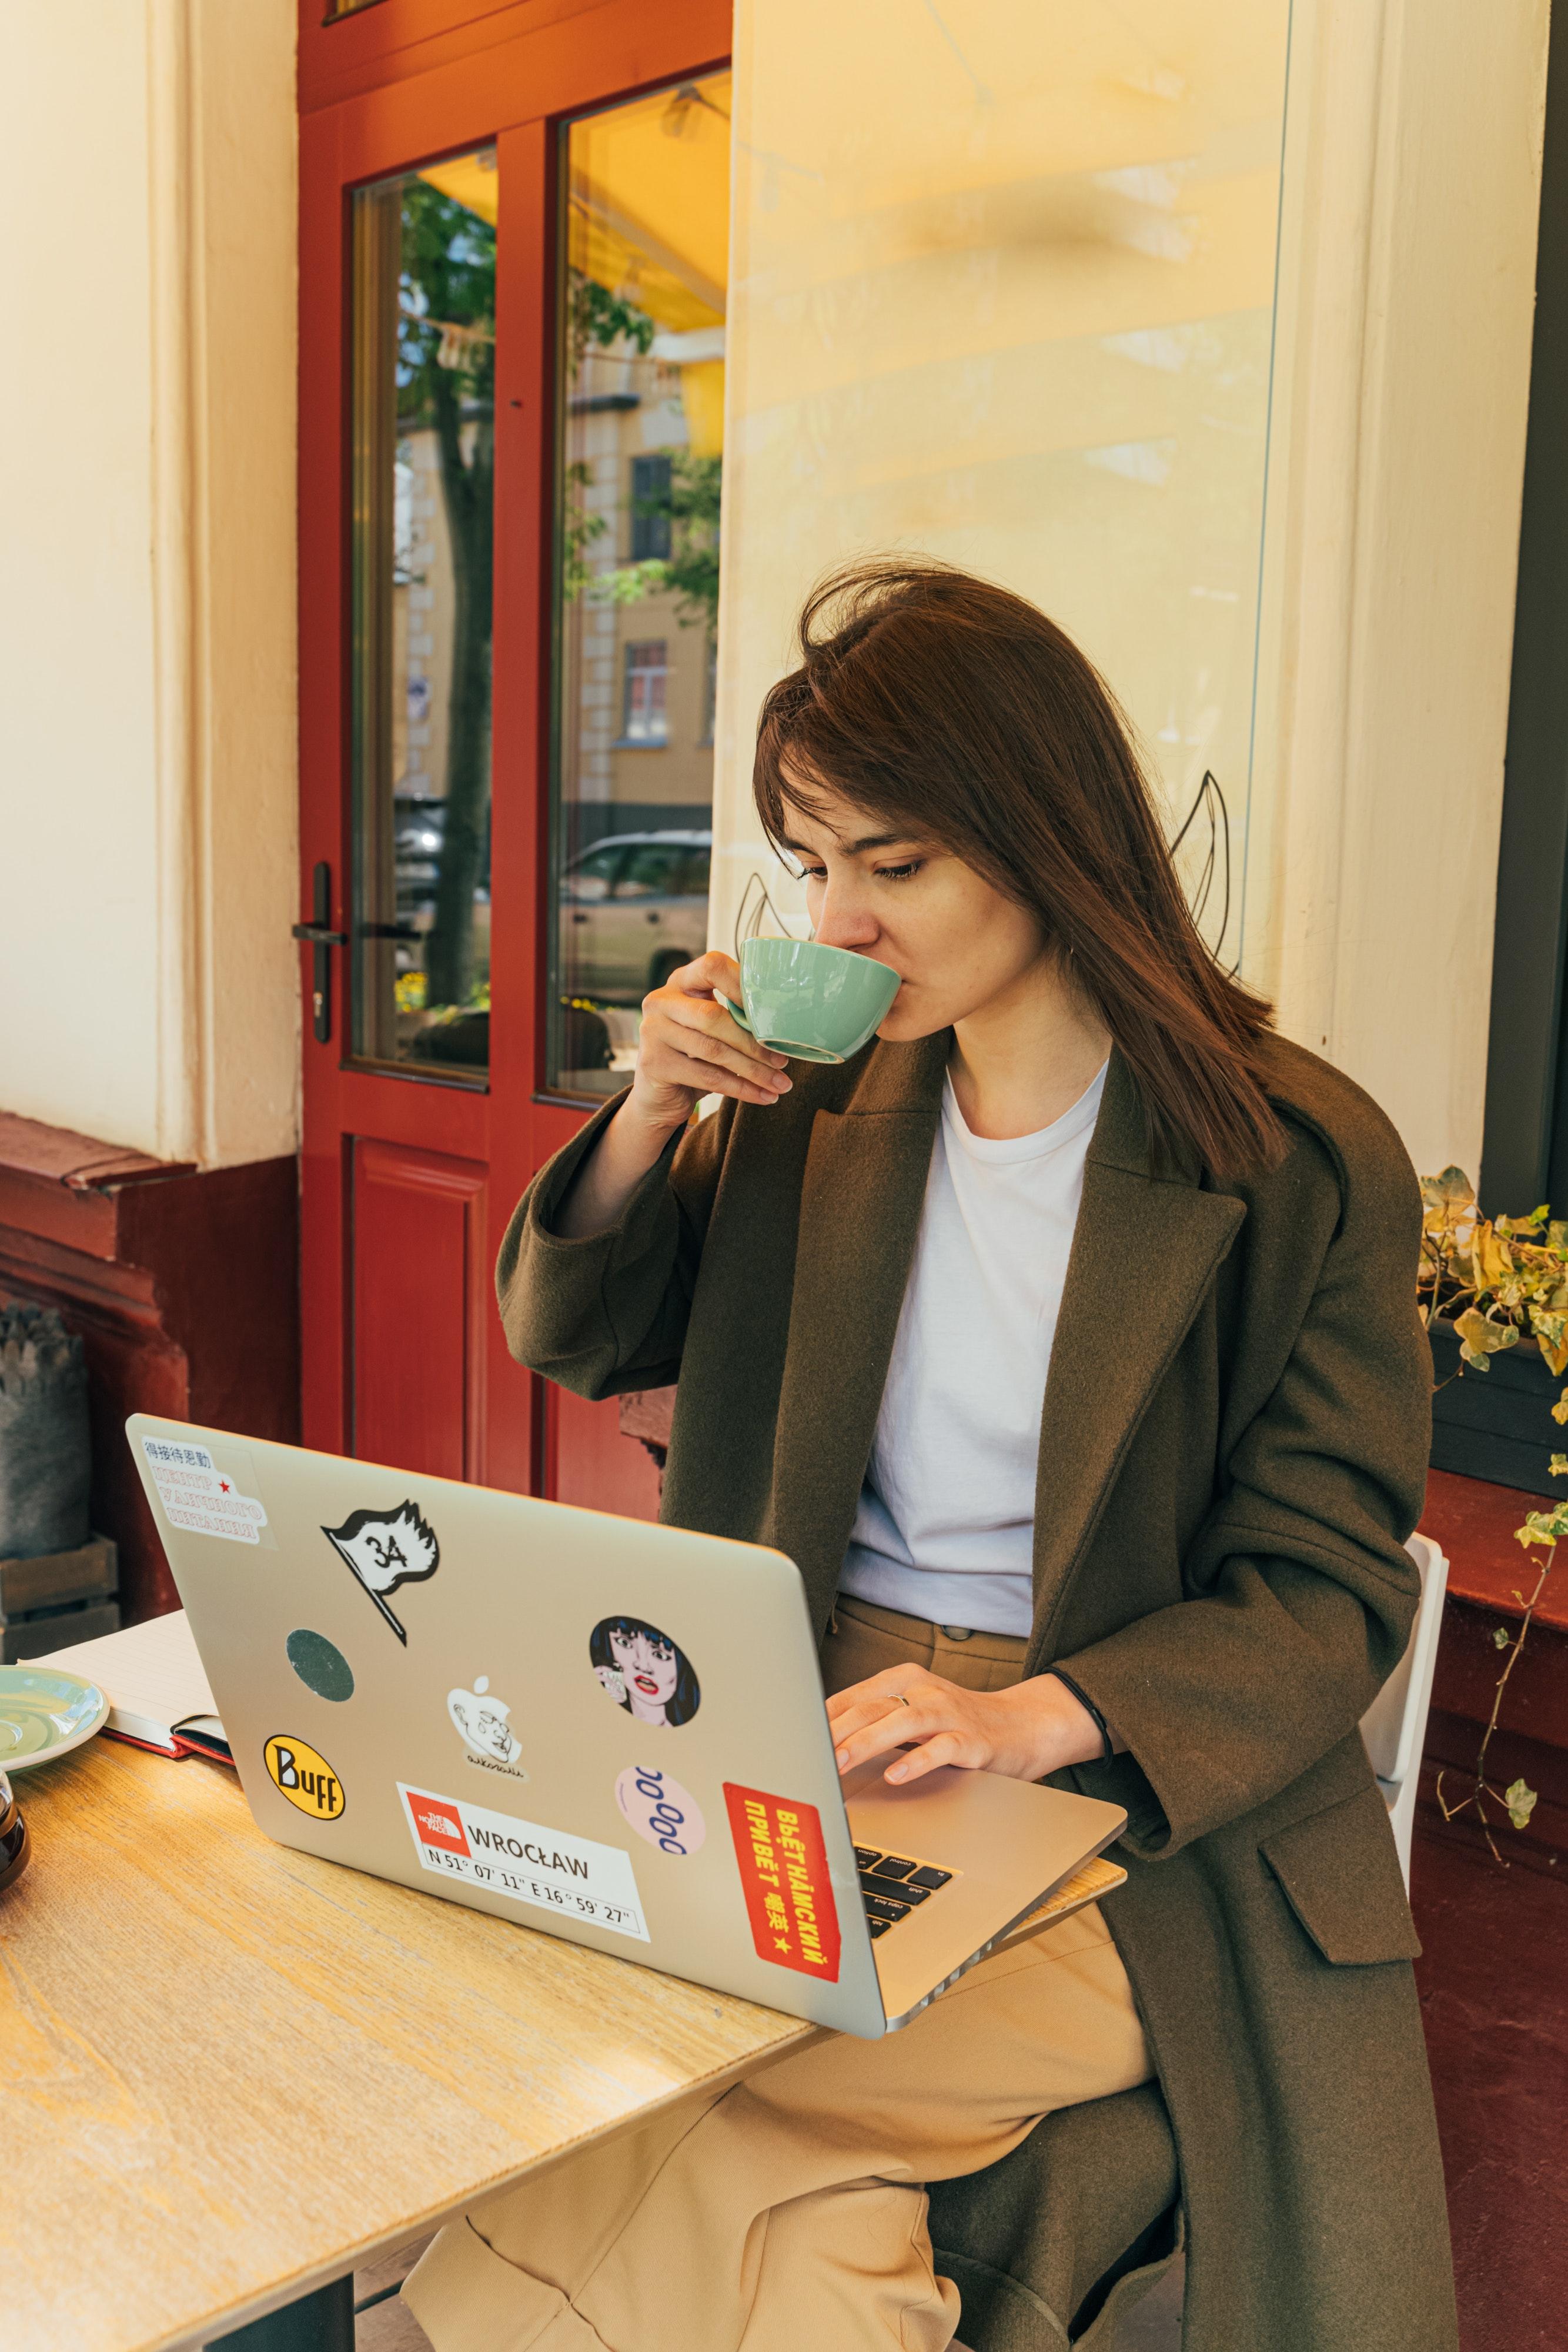 people-woman-coffee-cup-4442093